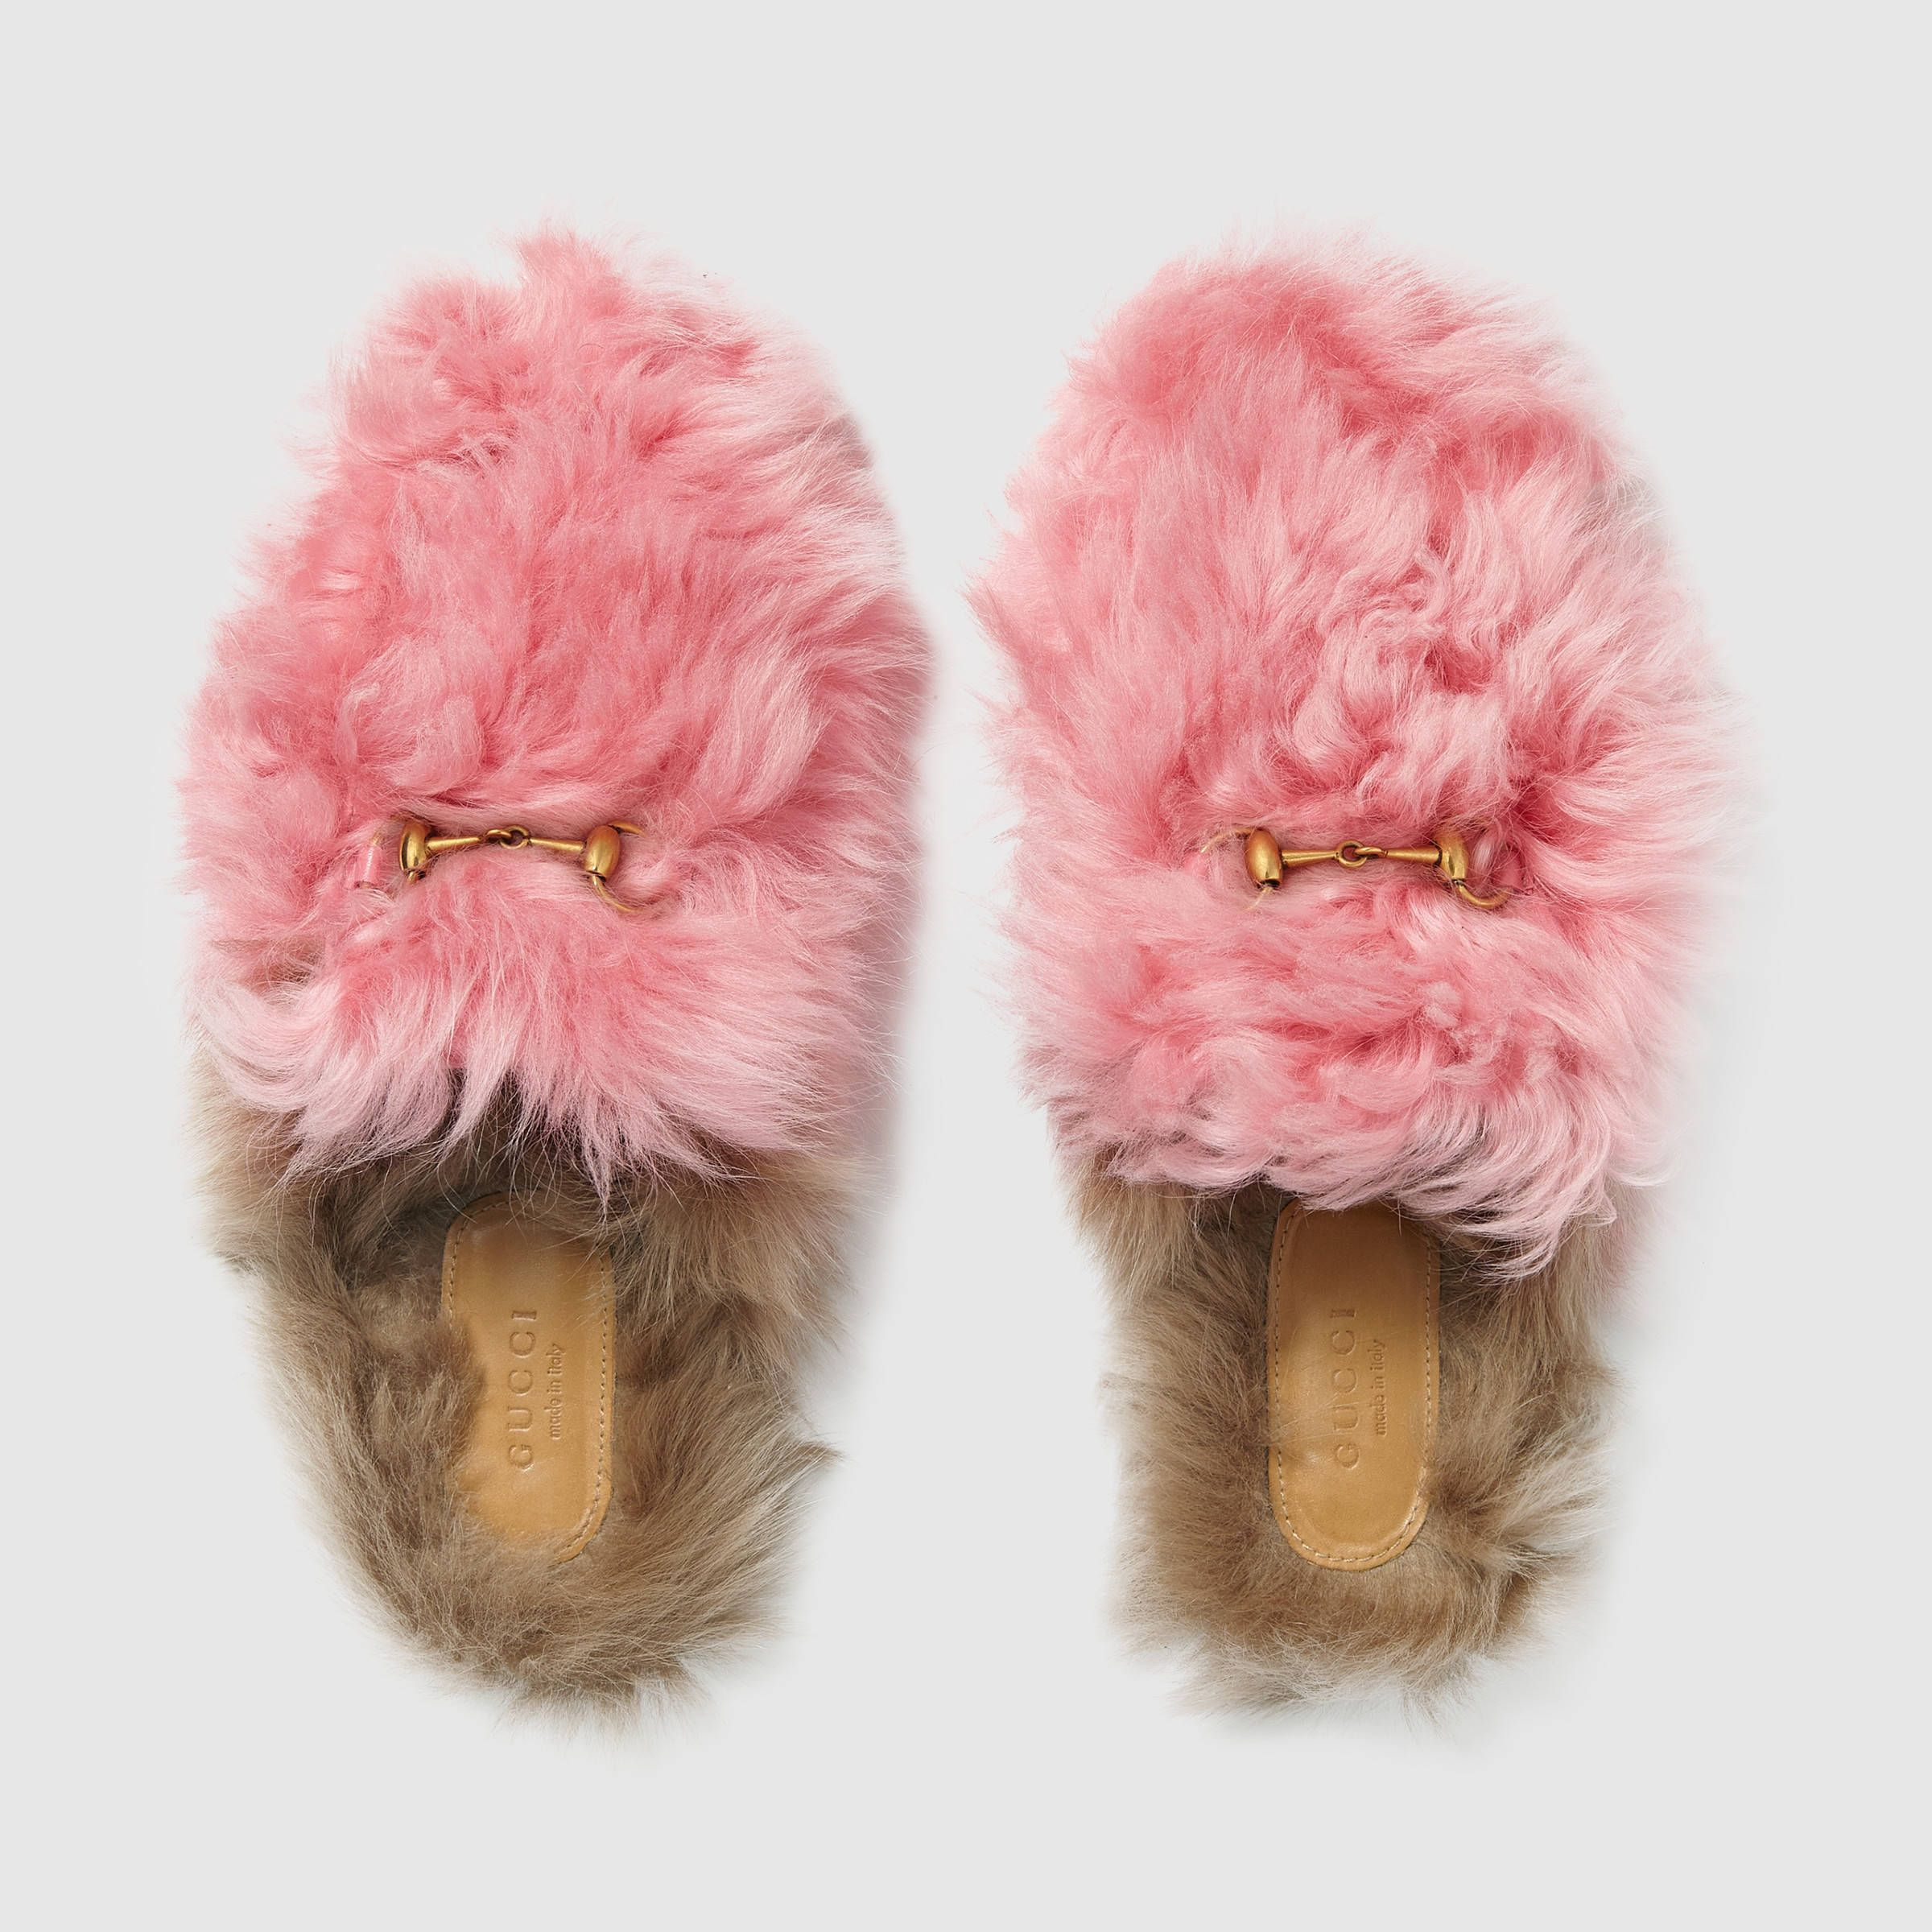 10384823de3 Gucci Princetown merino wool slipper